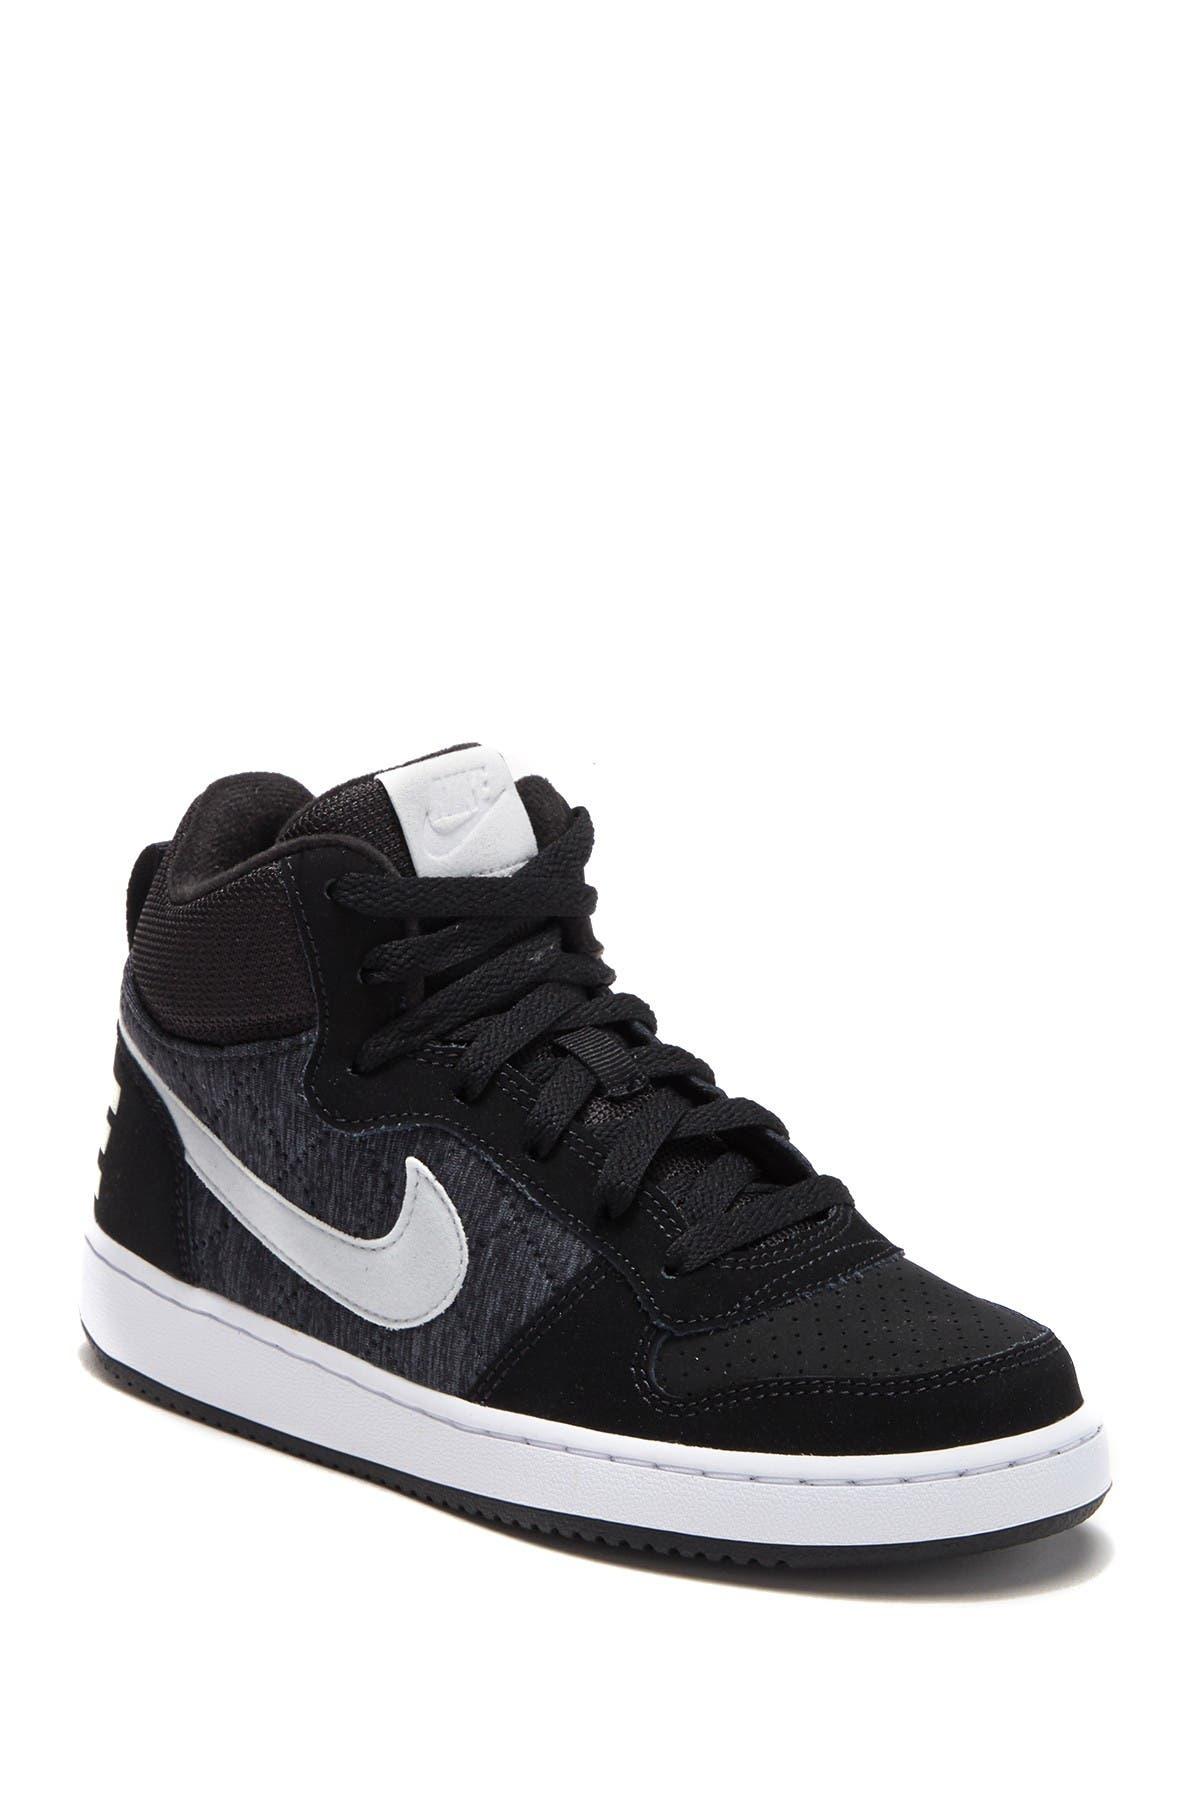 Nike   Court Borough High-Top Sneaker